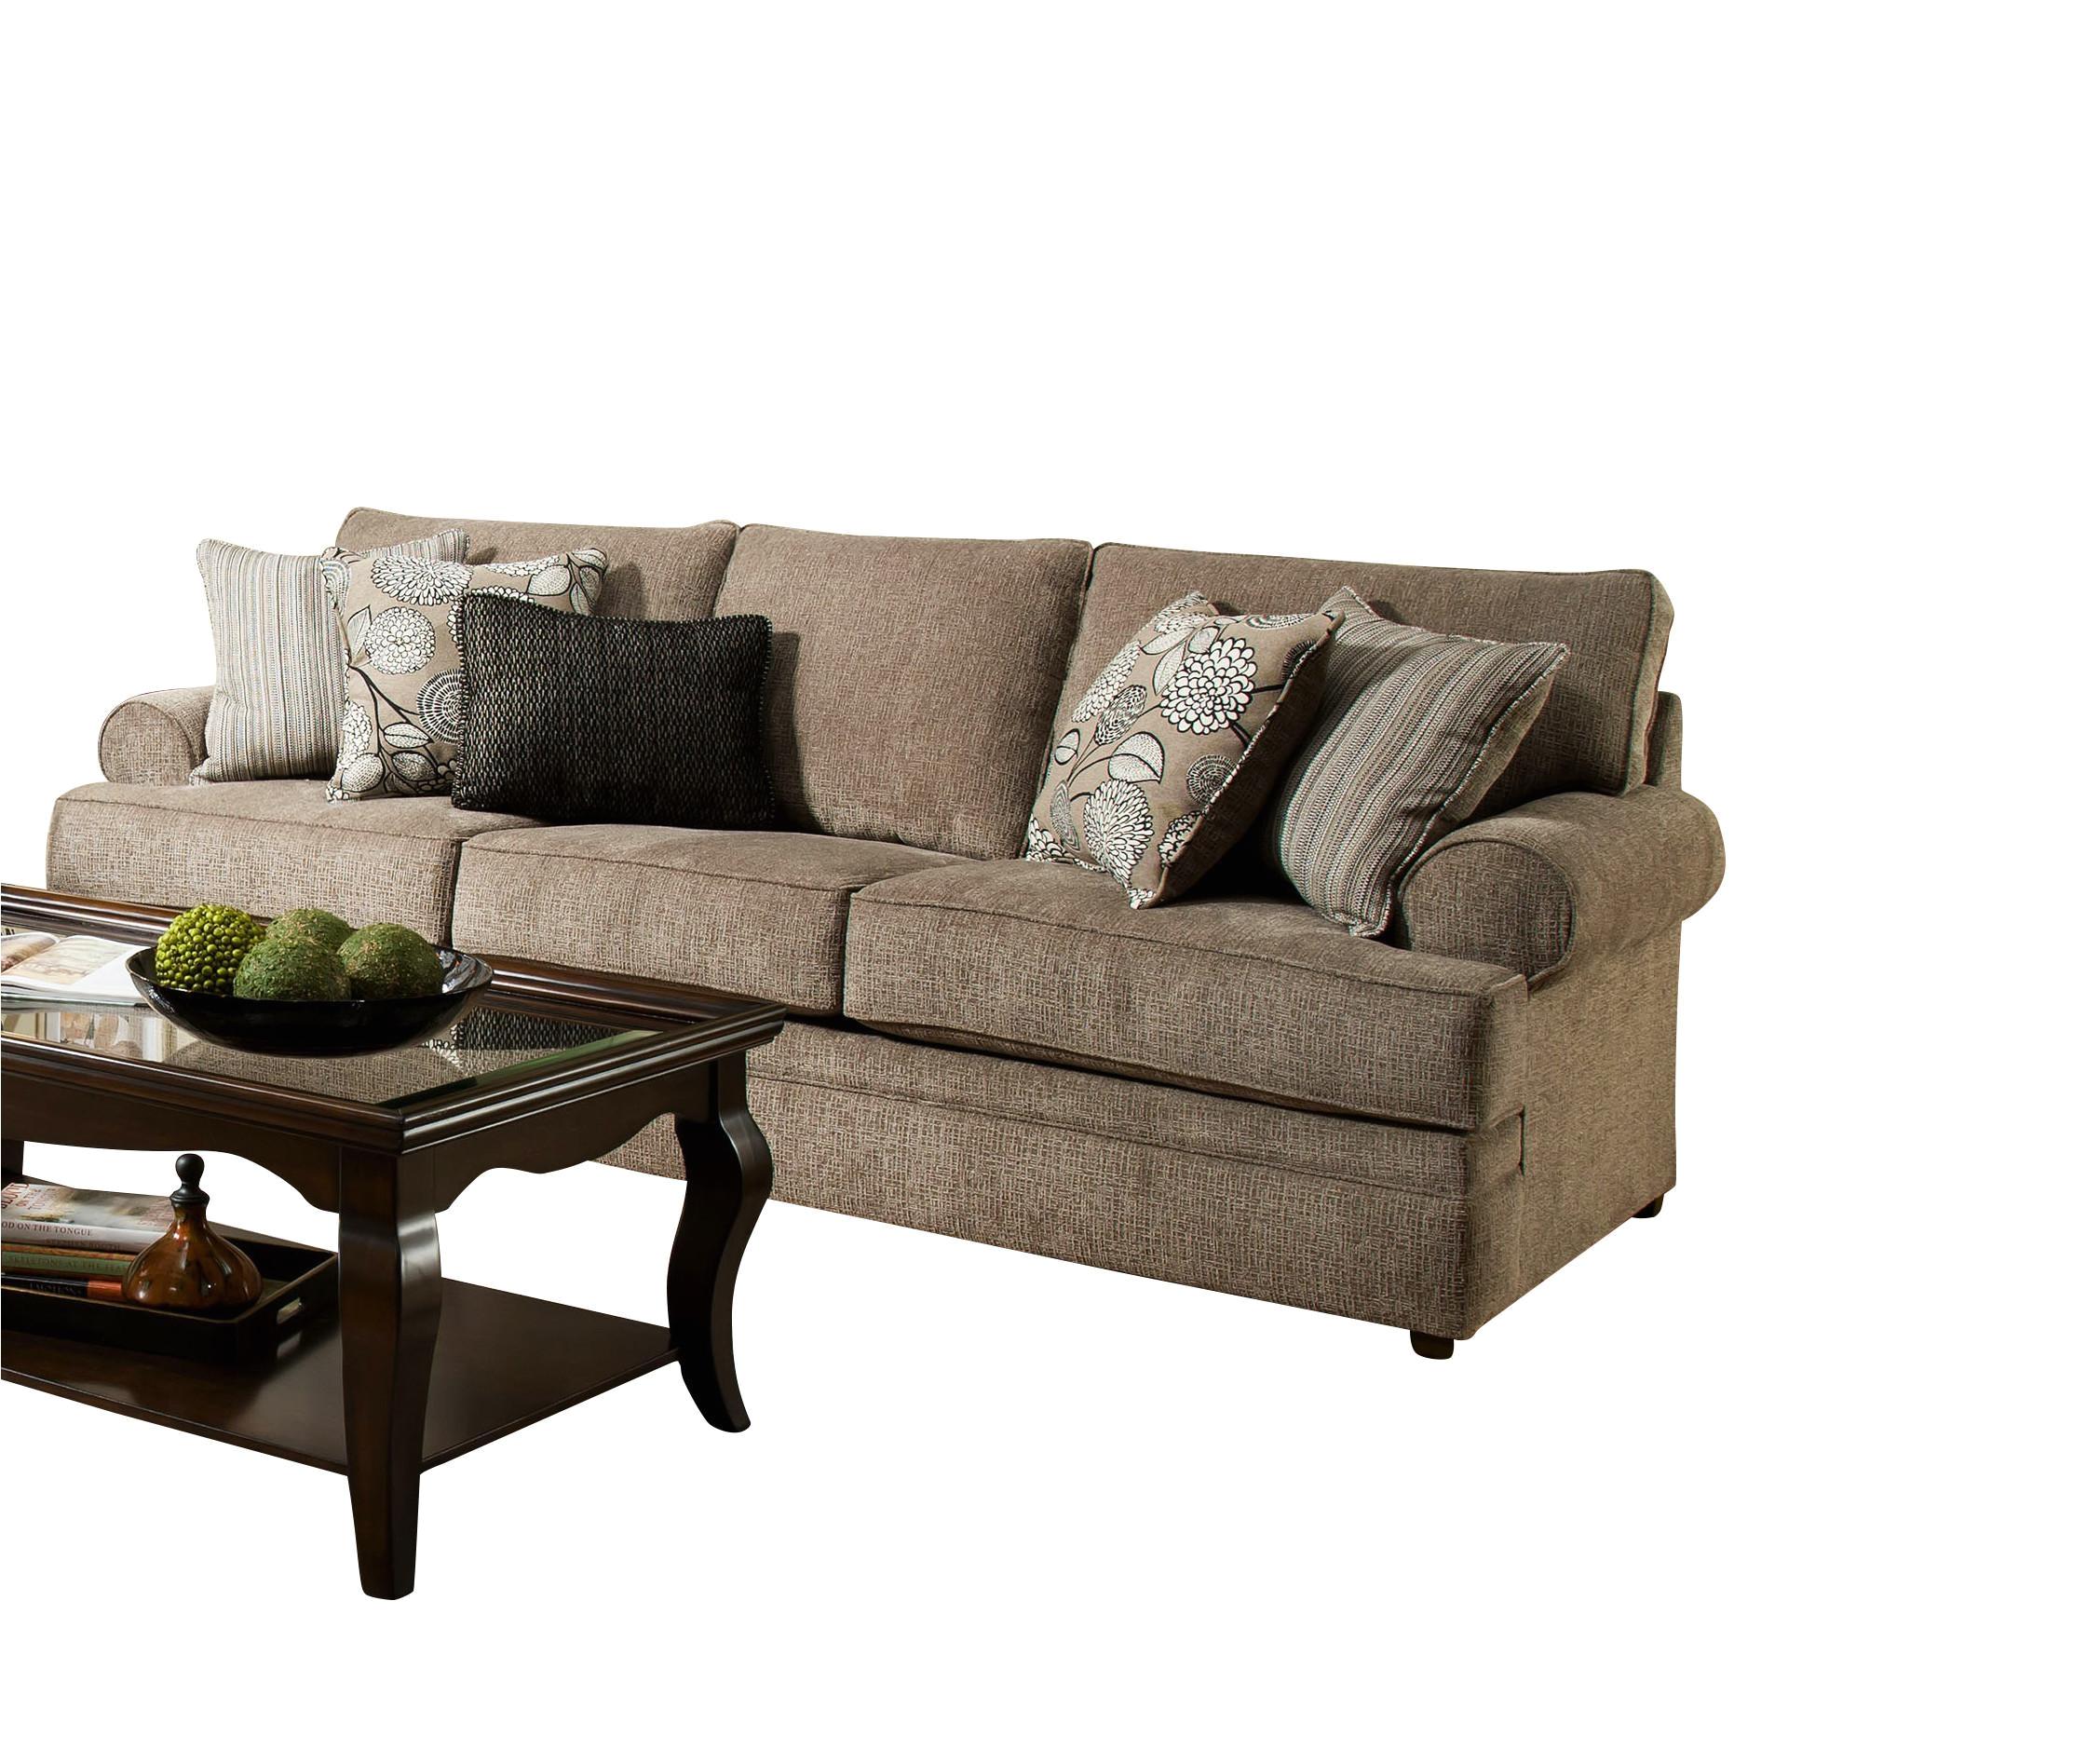 full size of home design macys tufted sofa elegant fresh macys furniture leather sofa 35 large size of home design macys tufted sofa elegant fresh macys